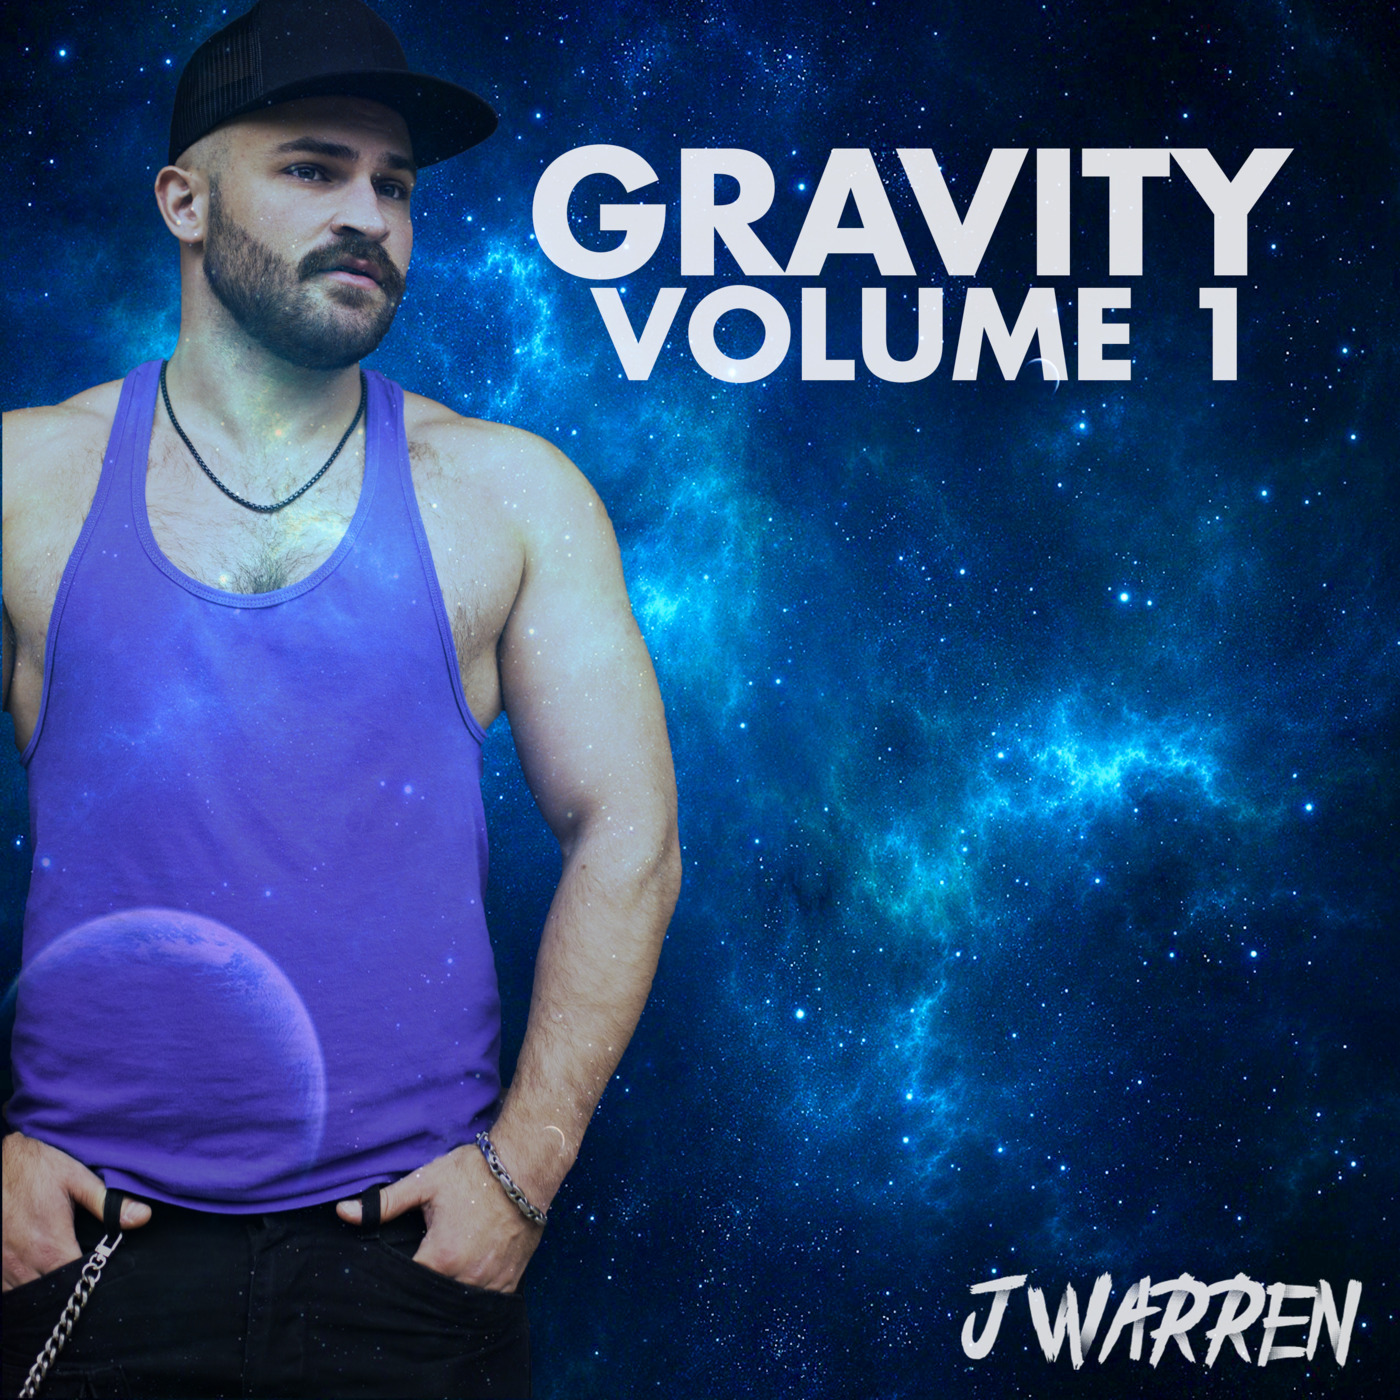 J Warren - Gravity Volume 1 J Warren's podcast